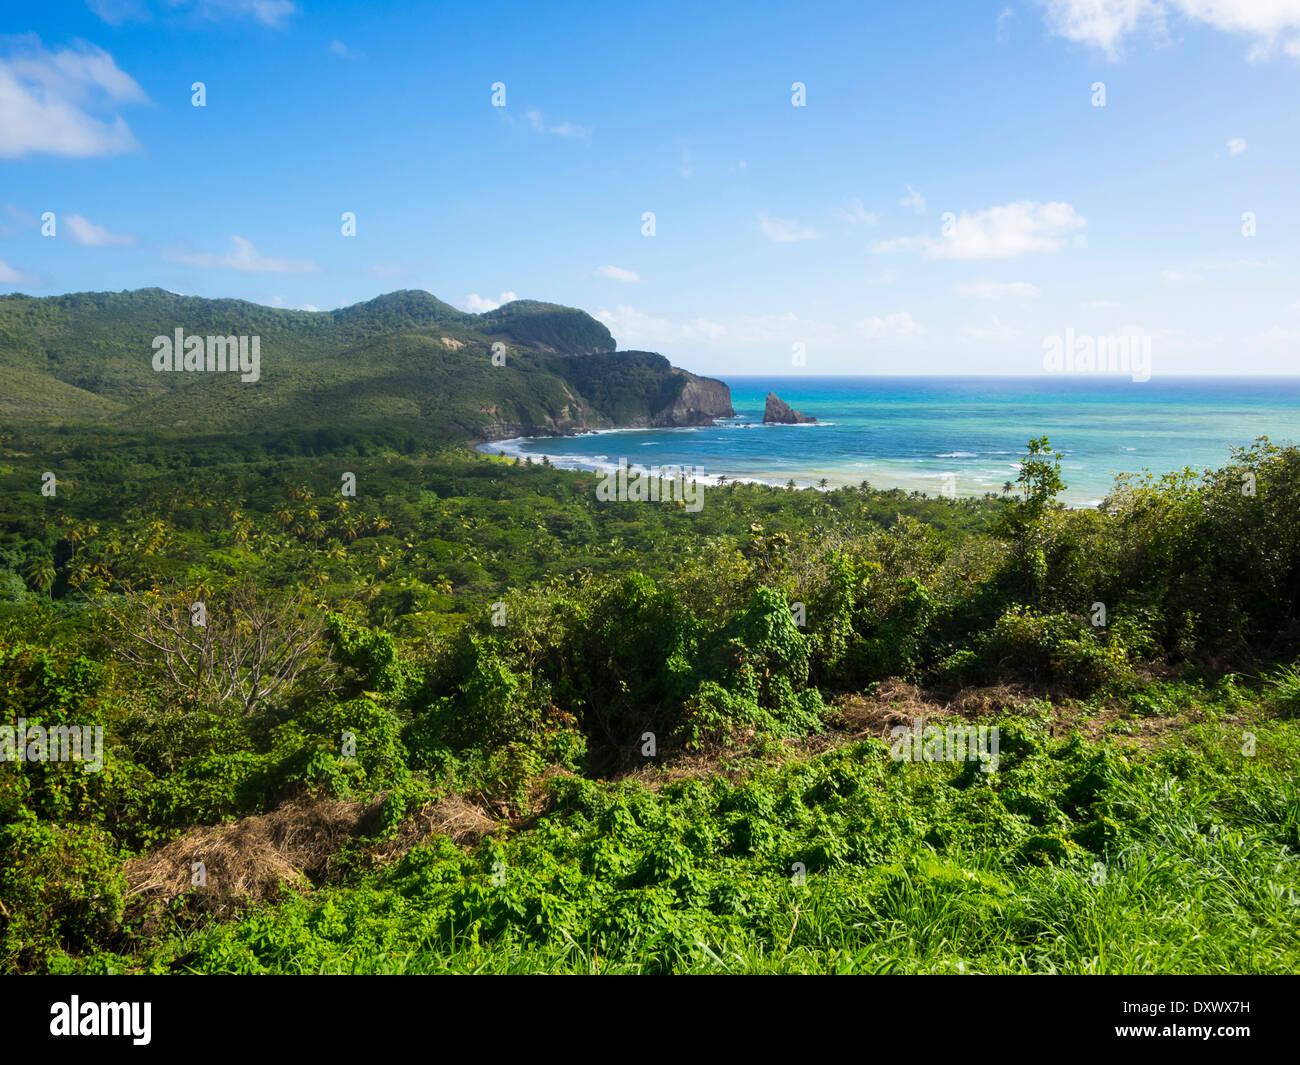 Fond d'Or Bay, near Dennery, Castries Quarter, Saint Lucia, Windward Islands, Lesser Antilles - Stock Image